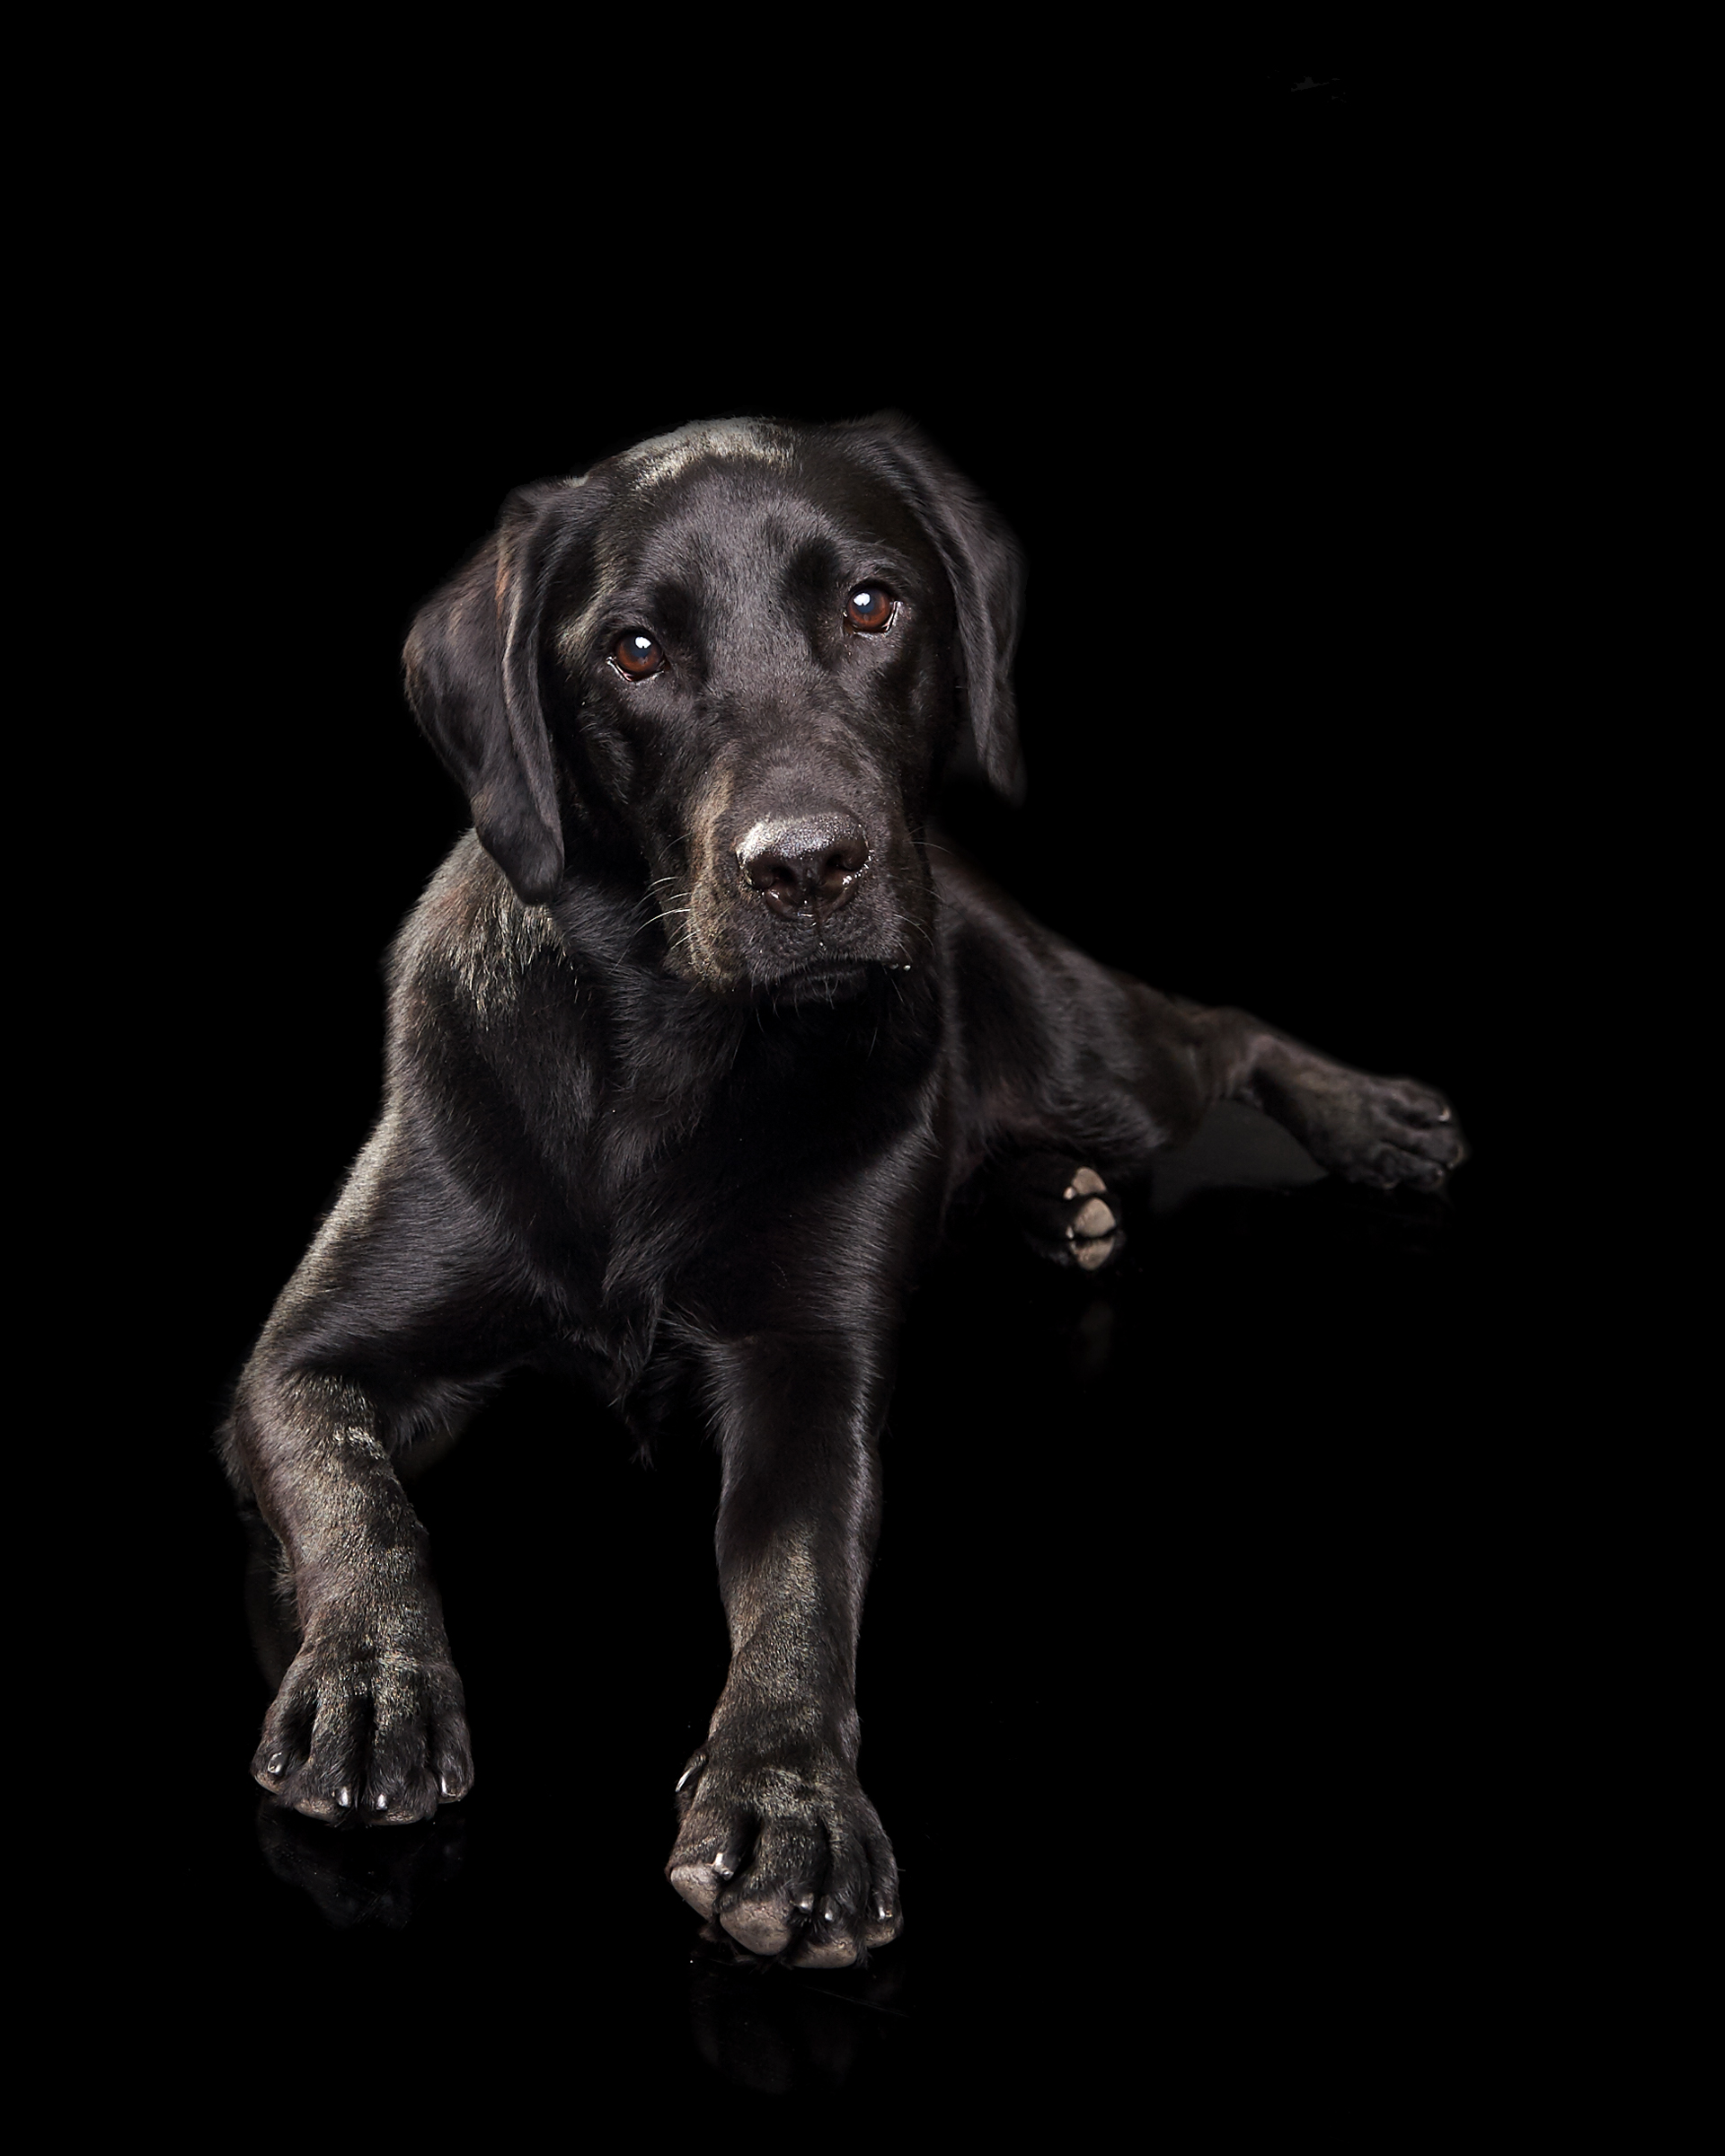 labrador_pet_dog_four_paws_portrait